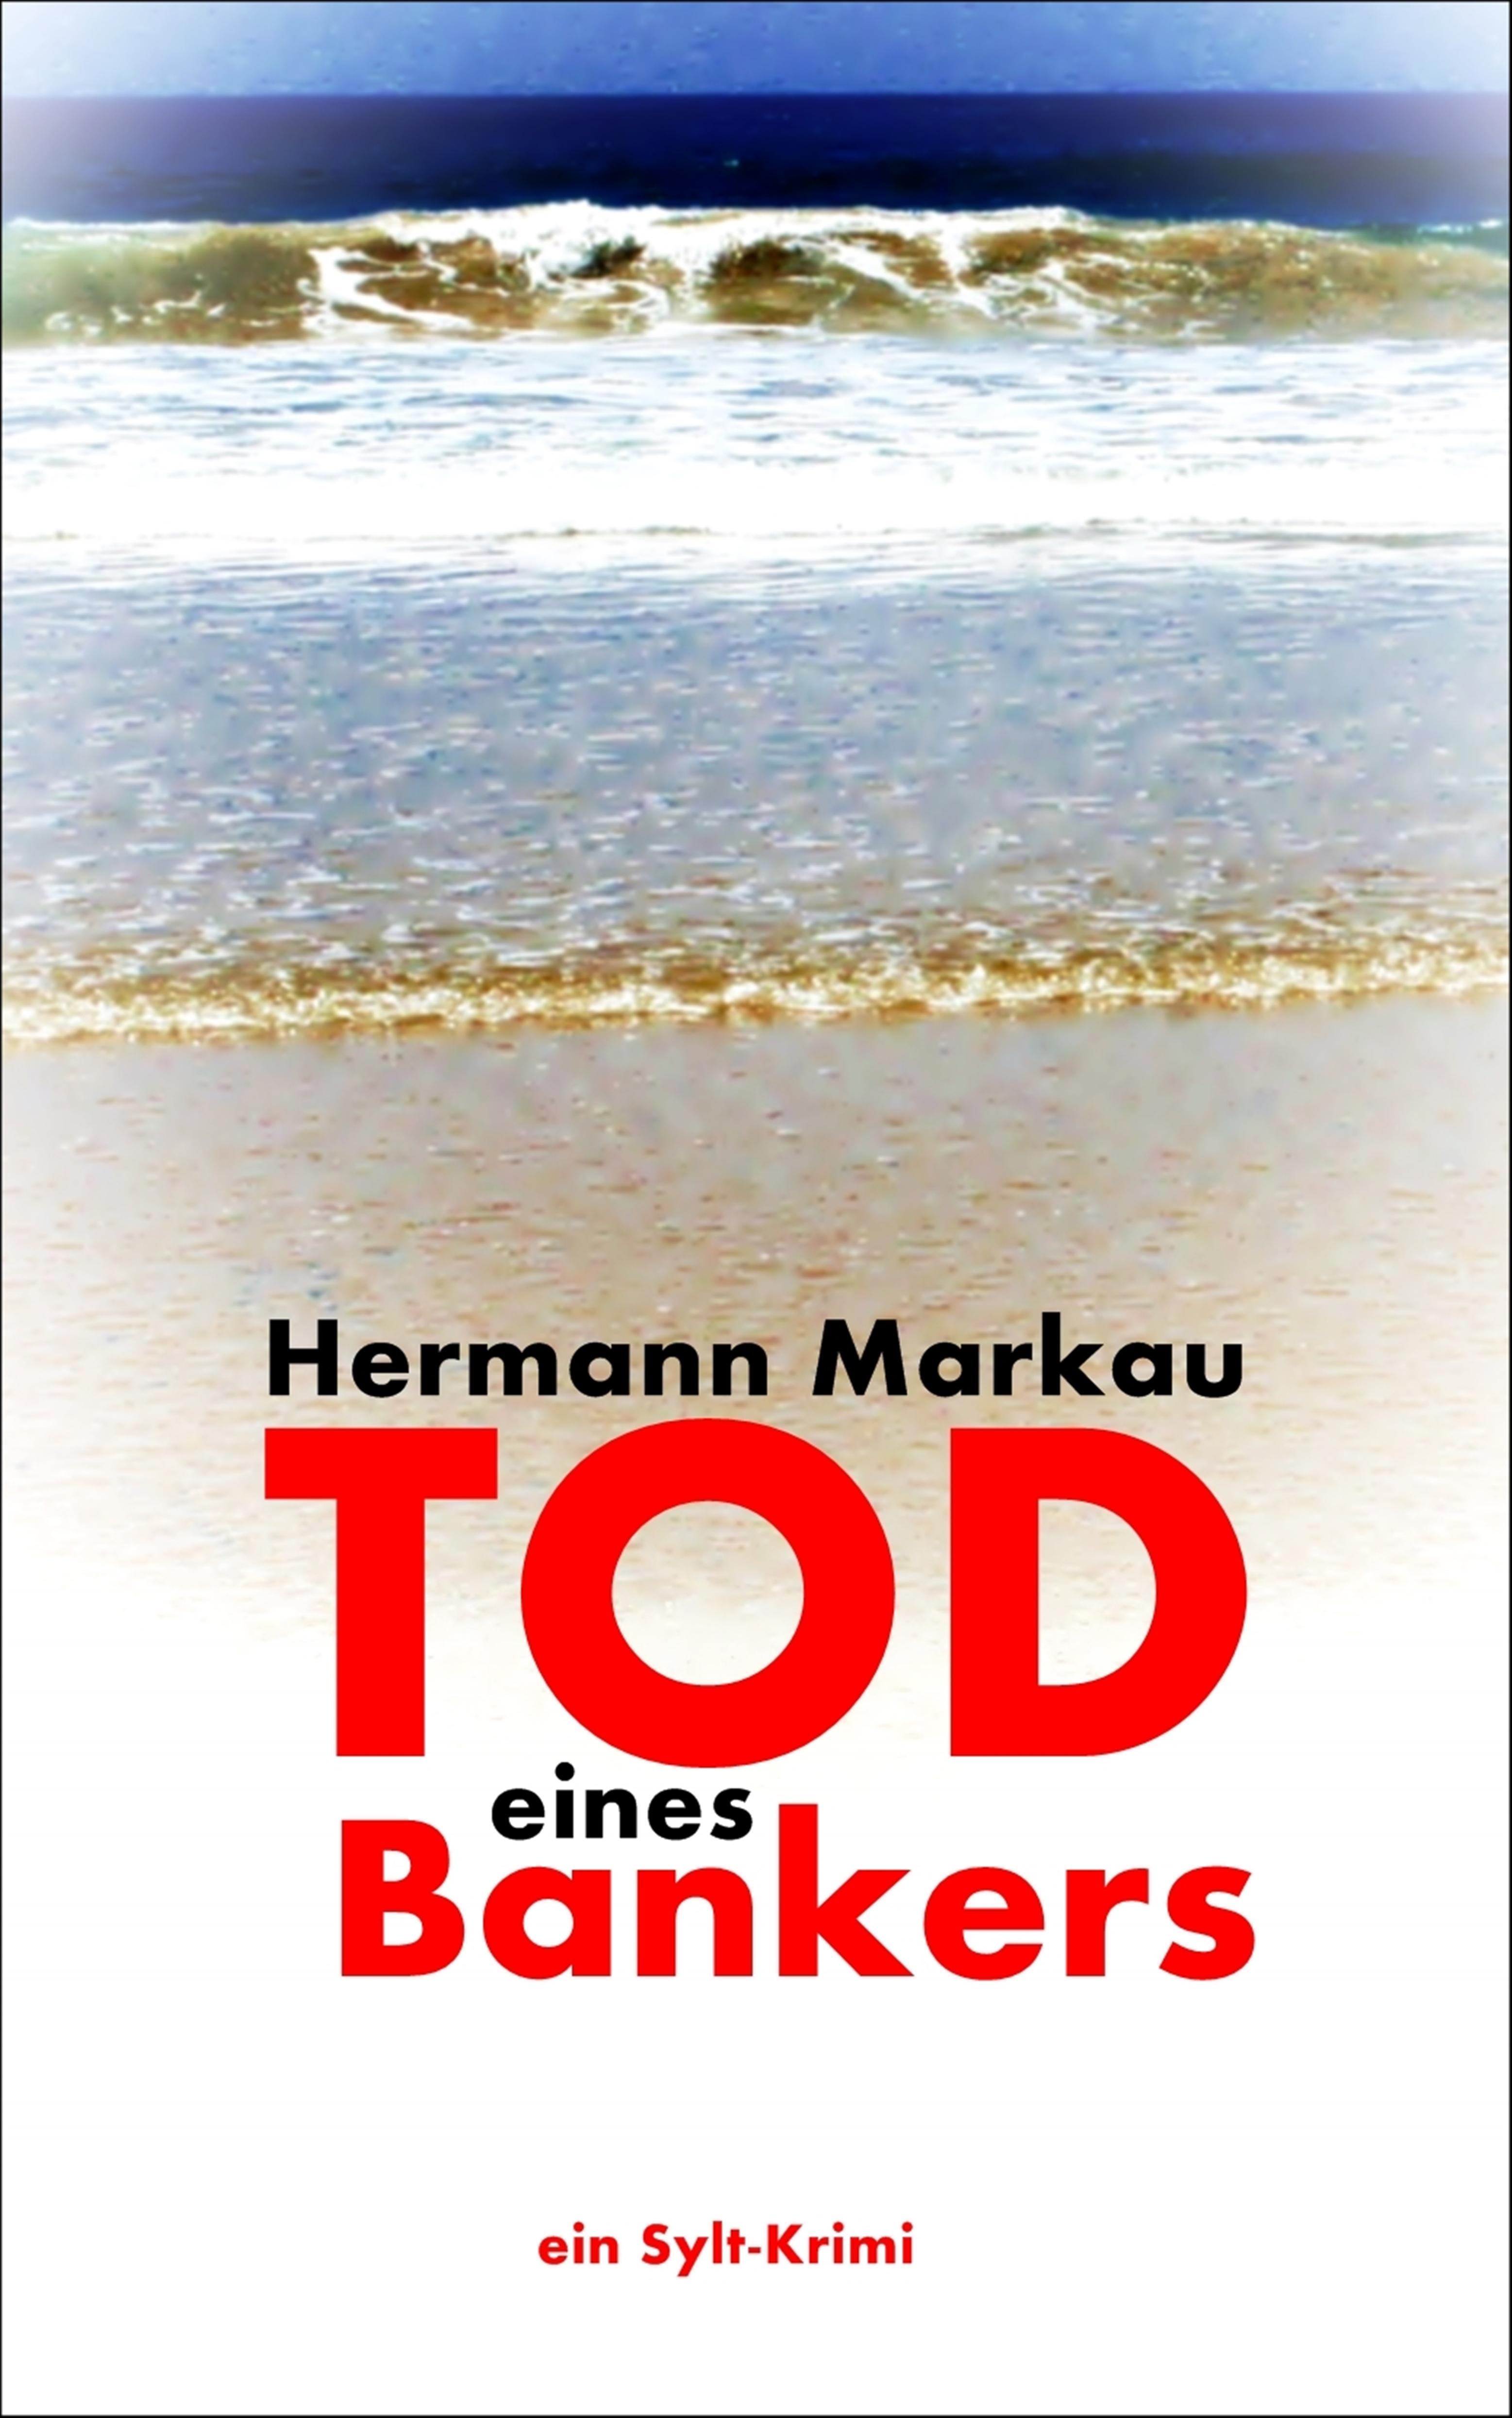 Hermann Markau – Tod eines Bankers